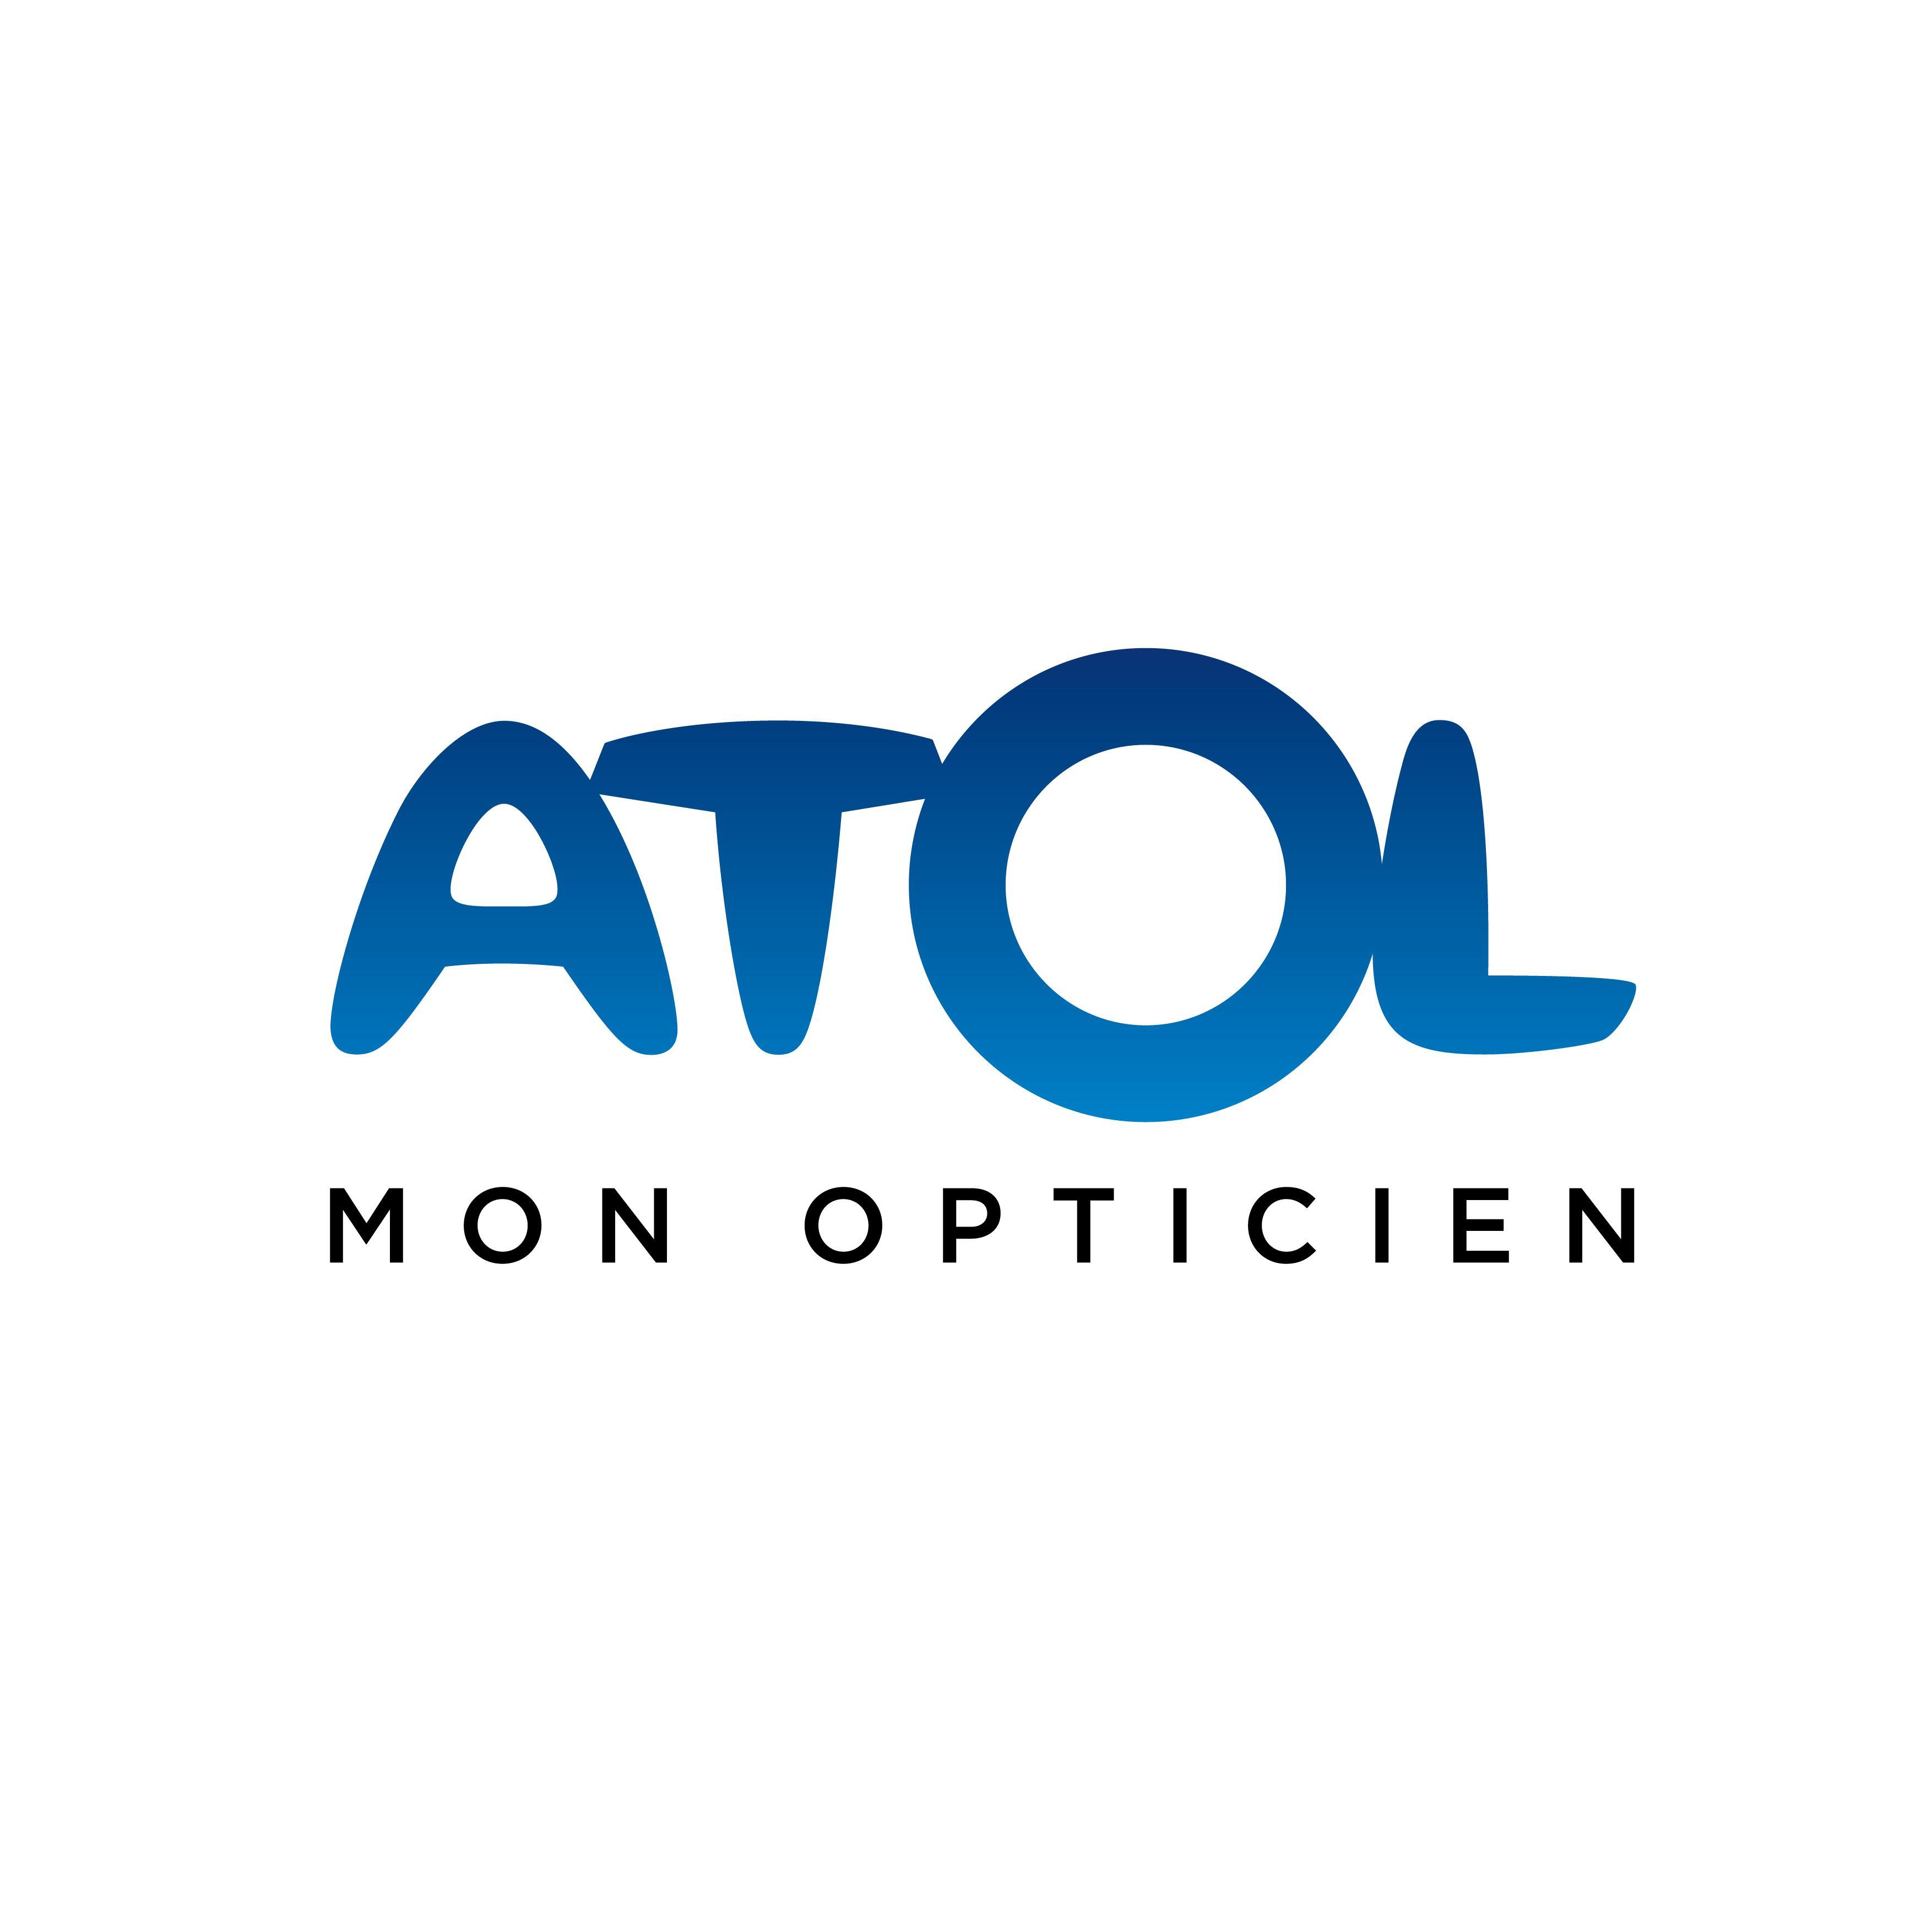 Atol Mon Opticien Rethel